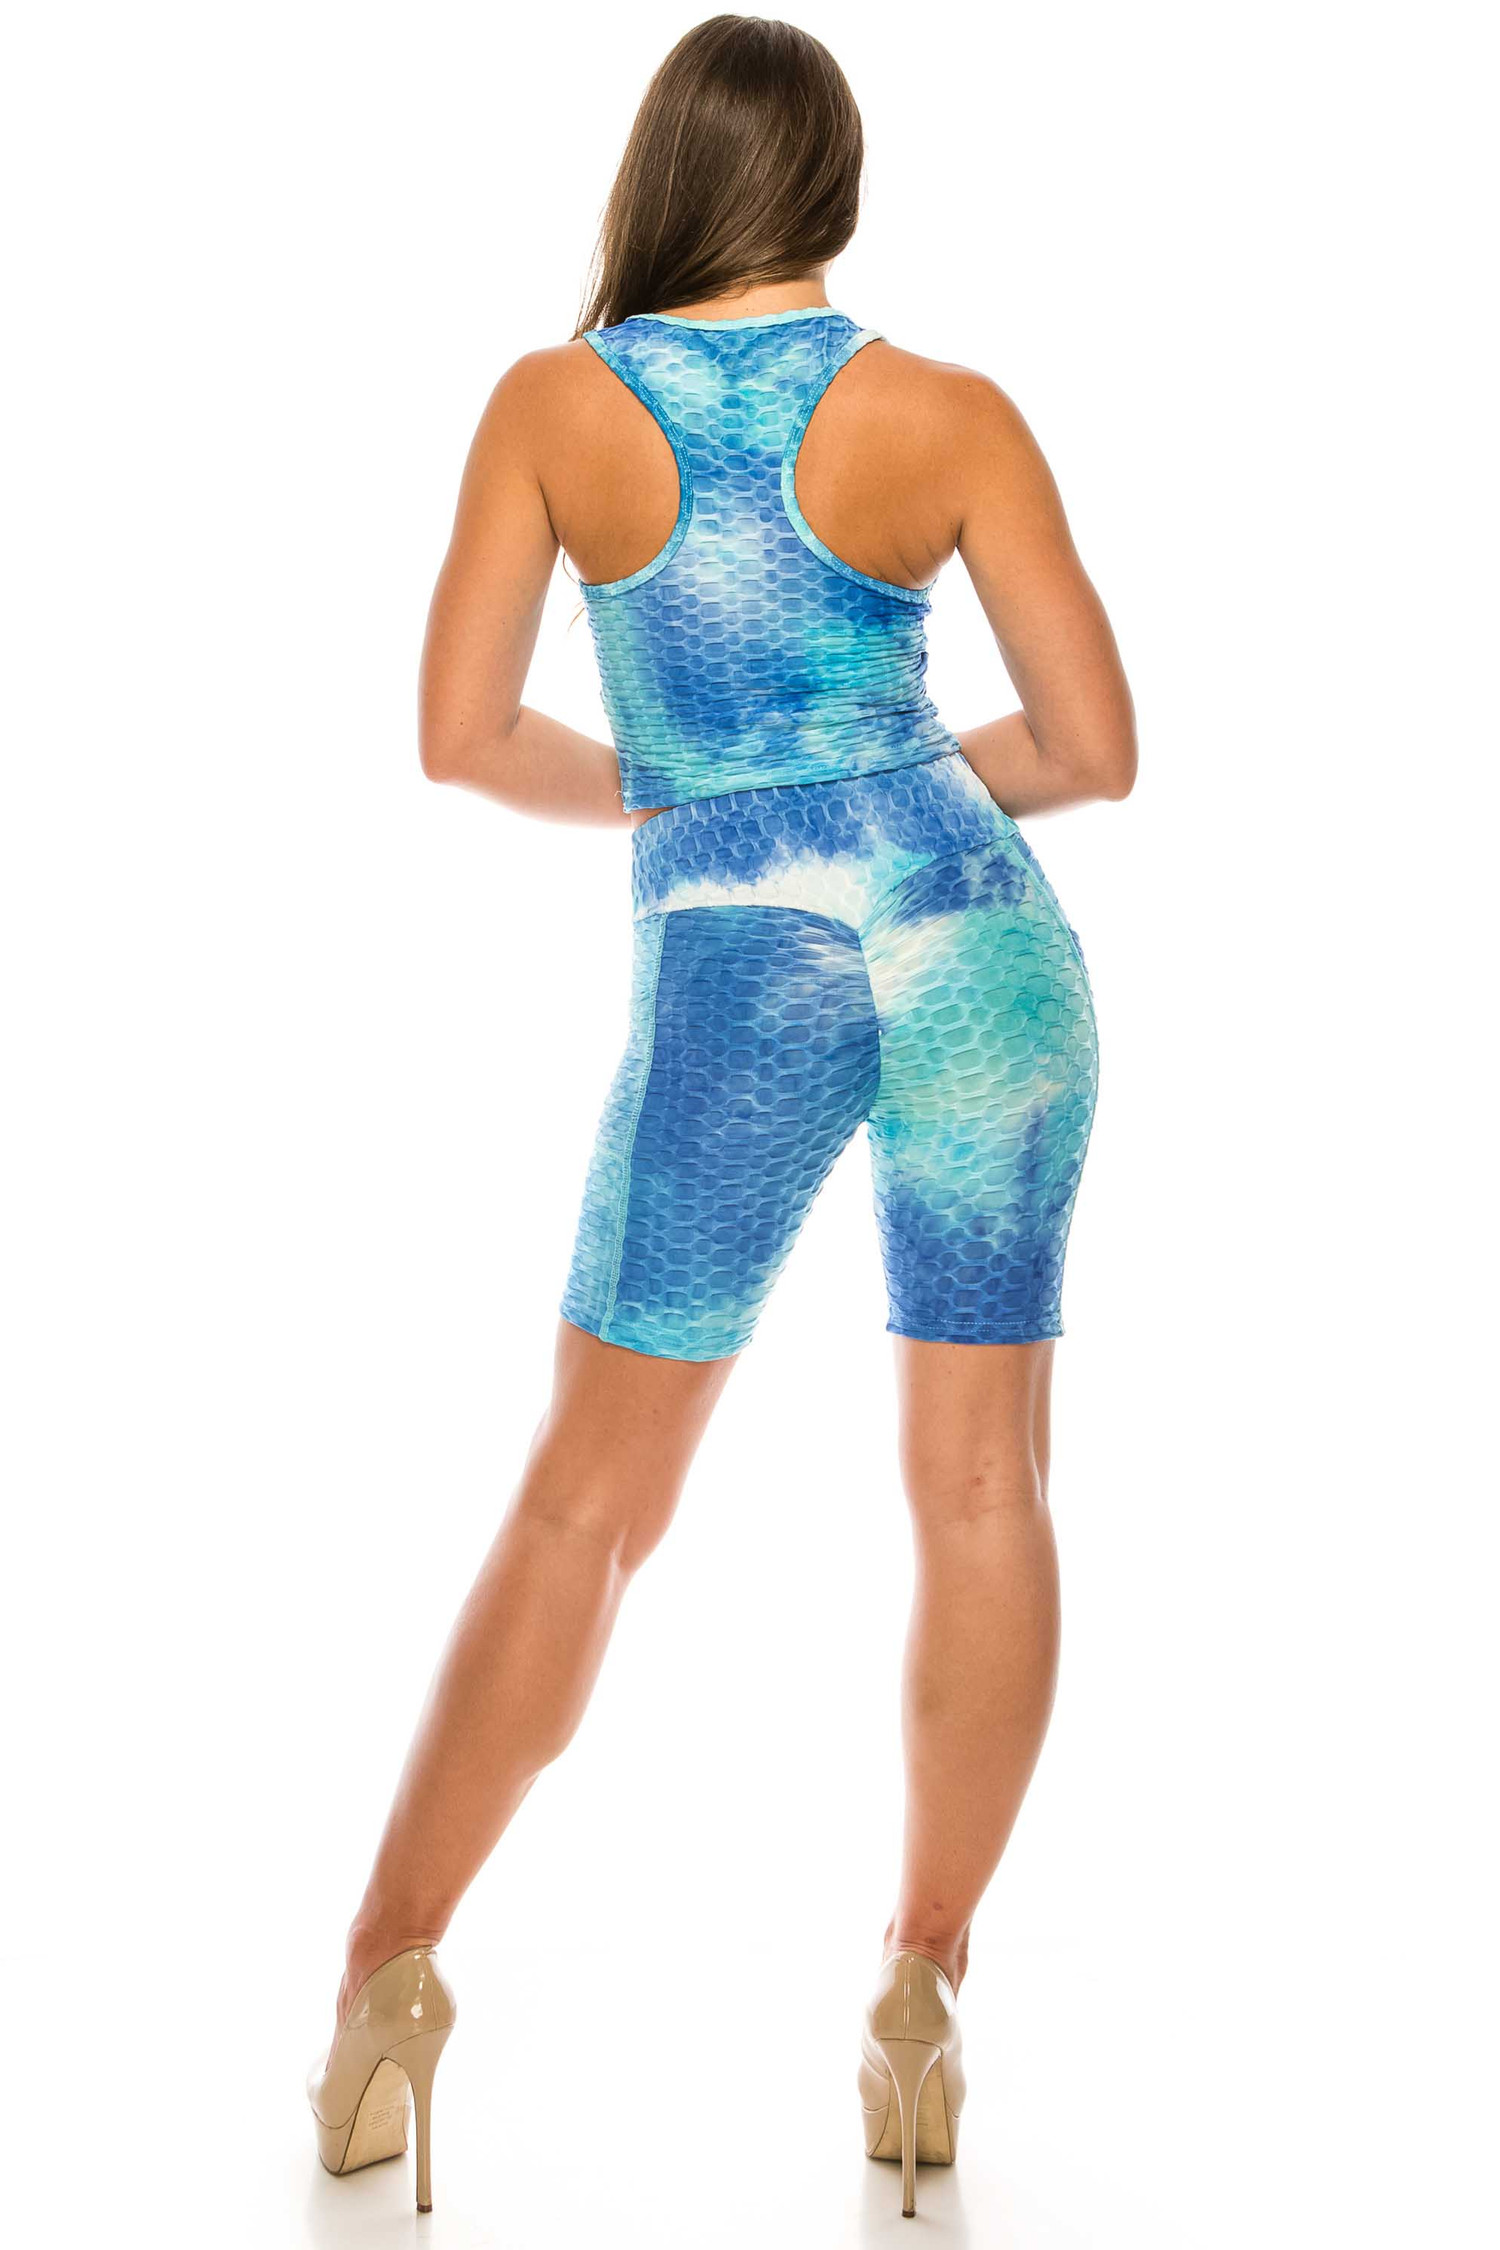 2 Piece Scrunch Butt Sport Shorts and Crop Top Set with Pockets